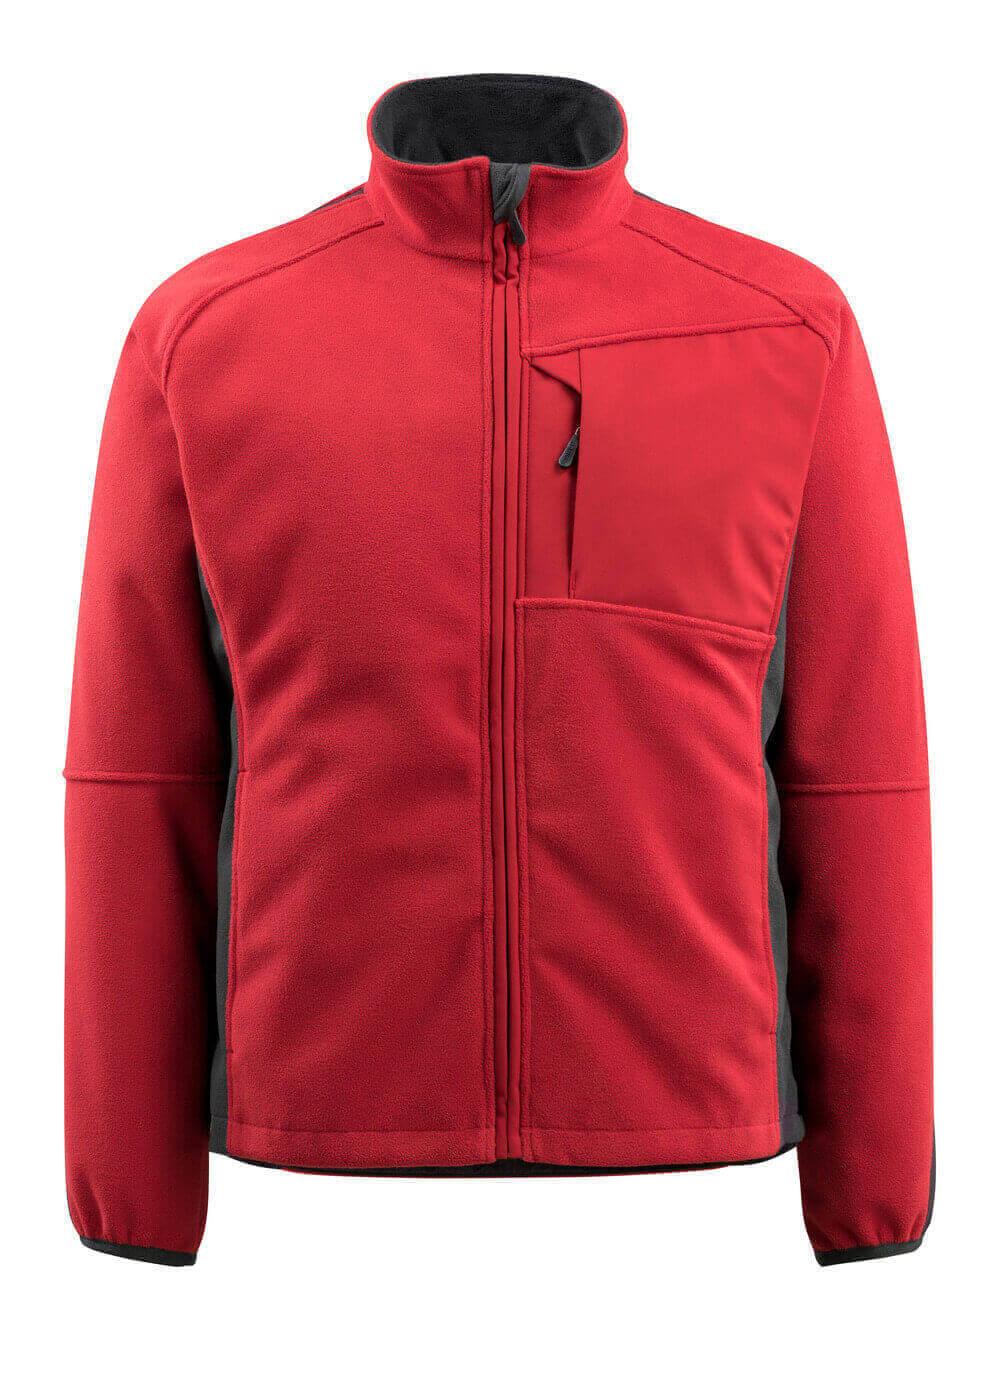 15603-259-0209 Fleece Jacket - red/black